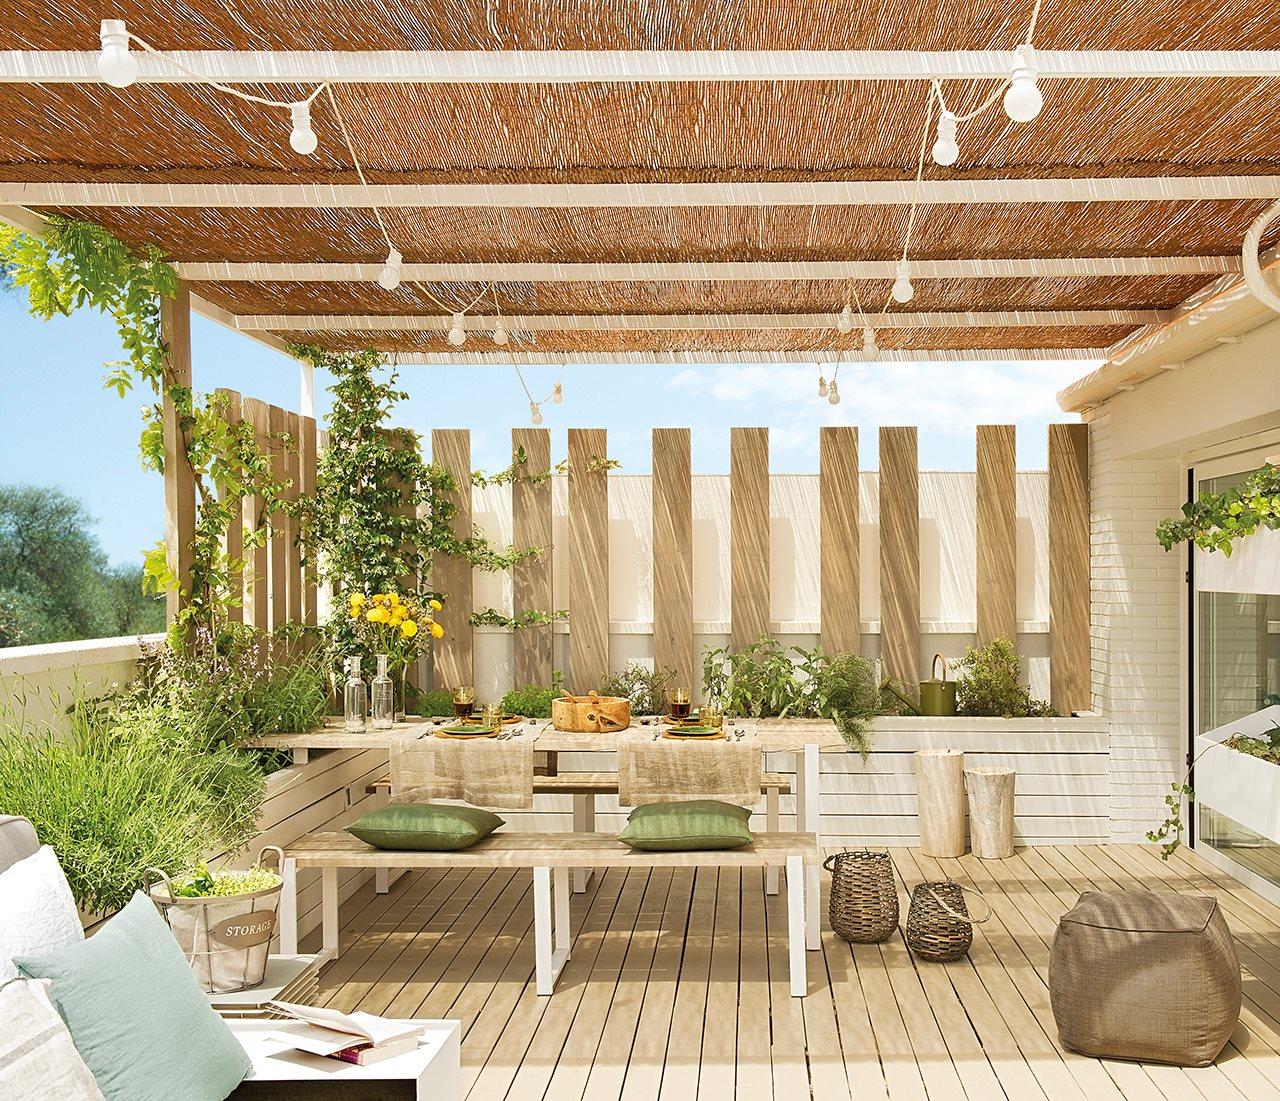 Un oasis en plena ciudad - Arredo terrazzi e balconi ...